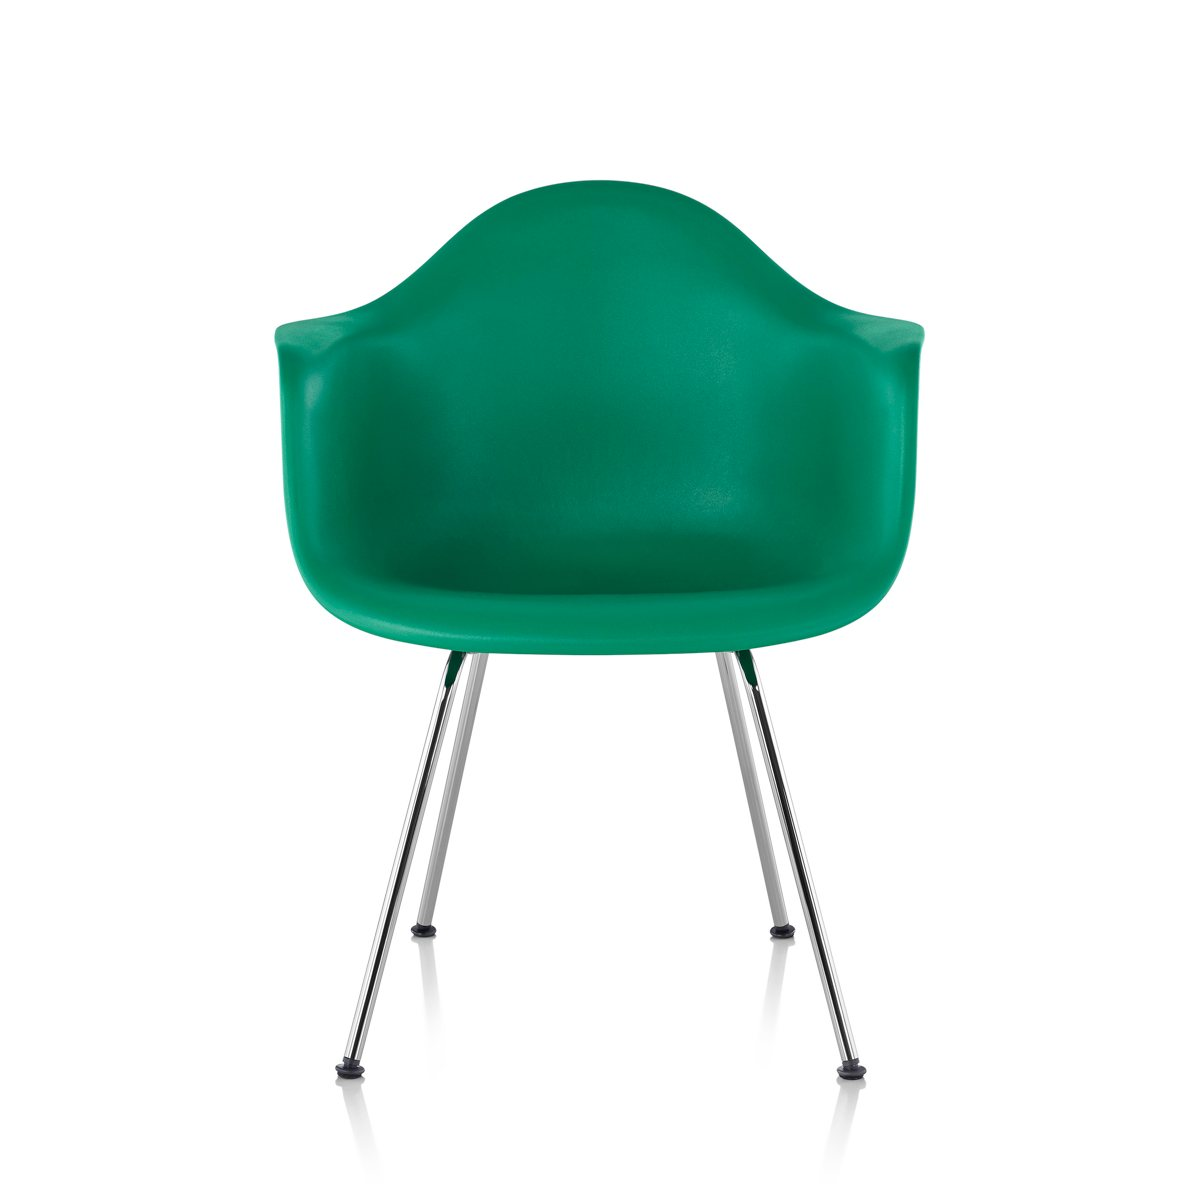 Herman miller eames molded plastic armchair 4 leg base by for Eames plastic armchair gunstig